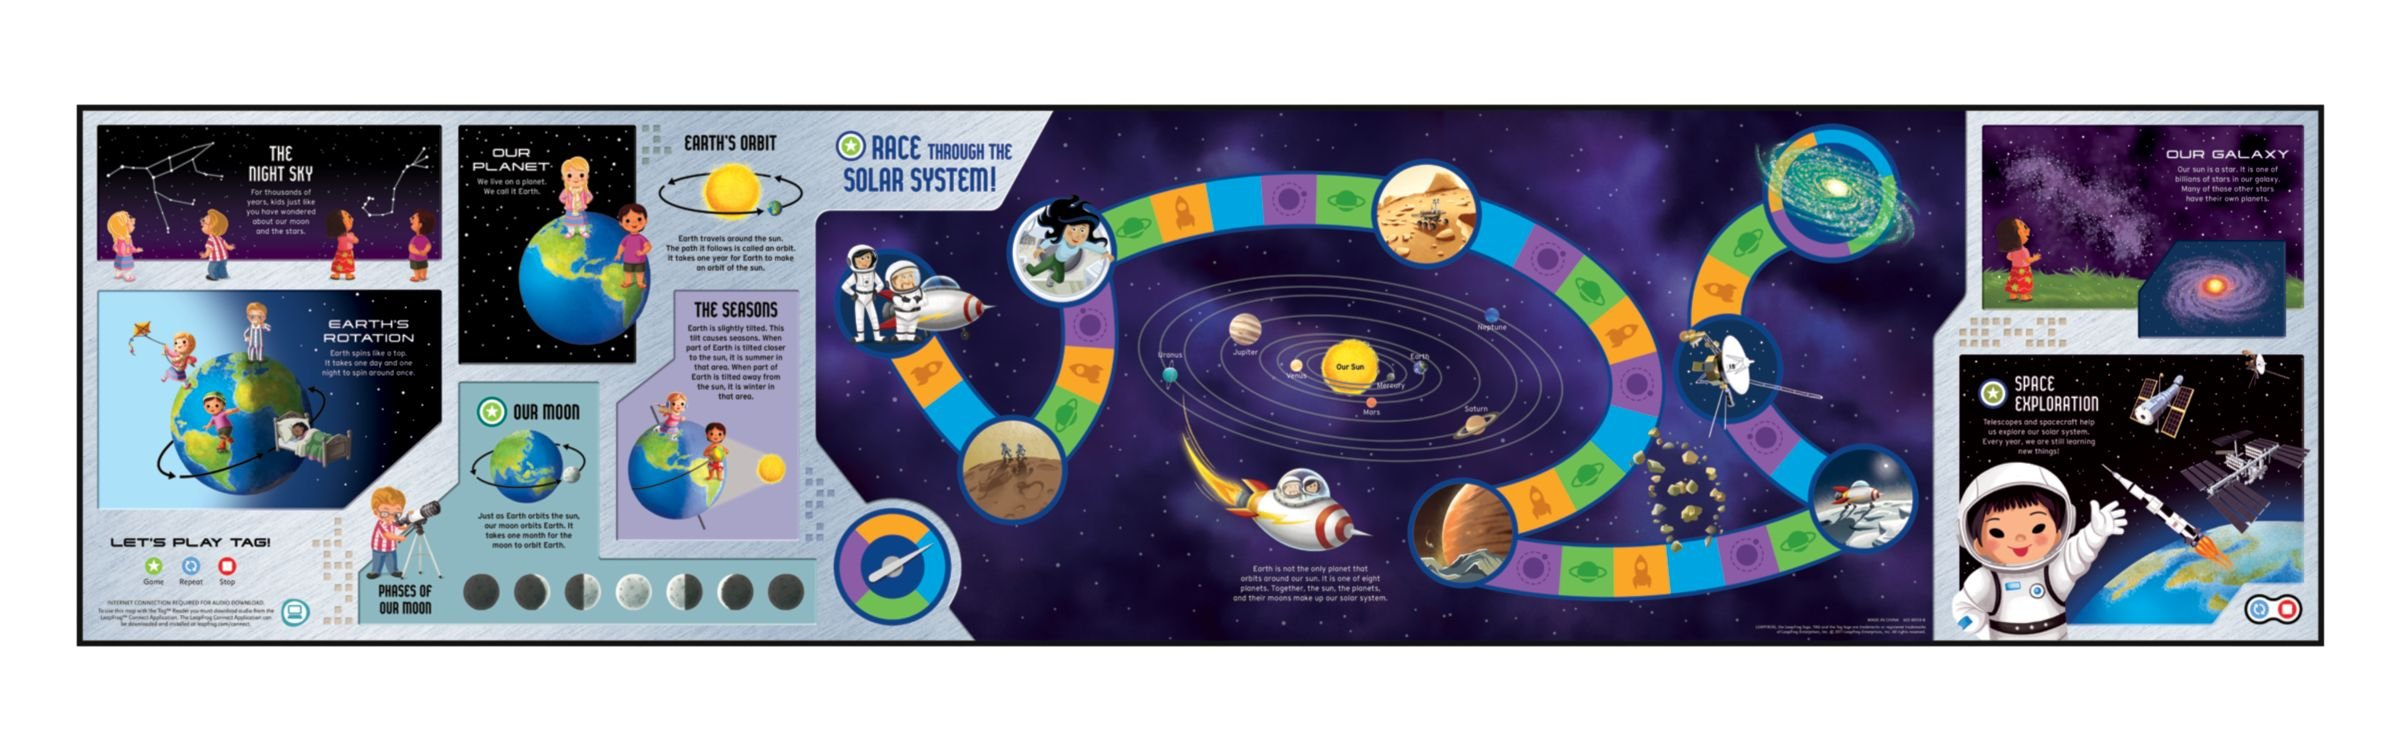 LeapFrog Tag Solar System Adventure Pack by LeapFrog (Image #2)